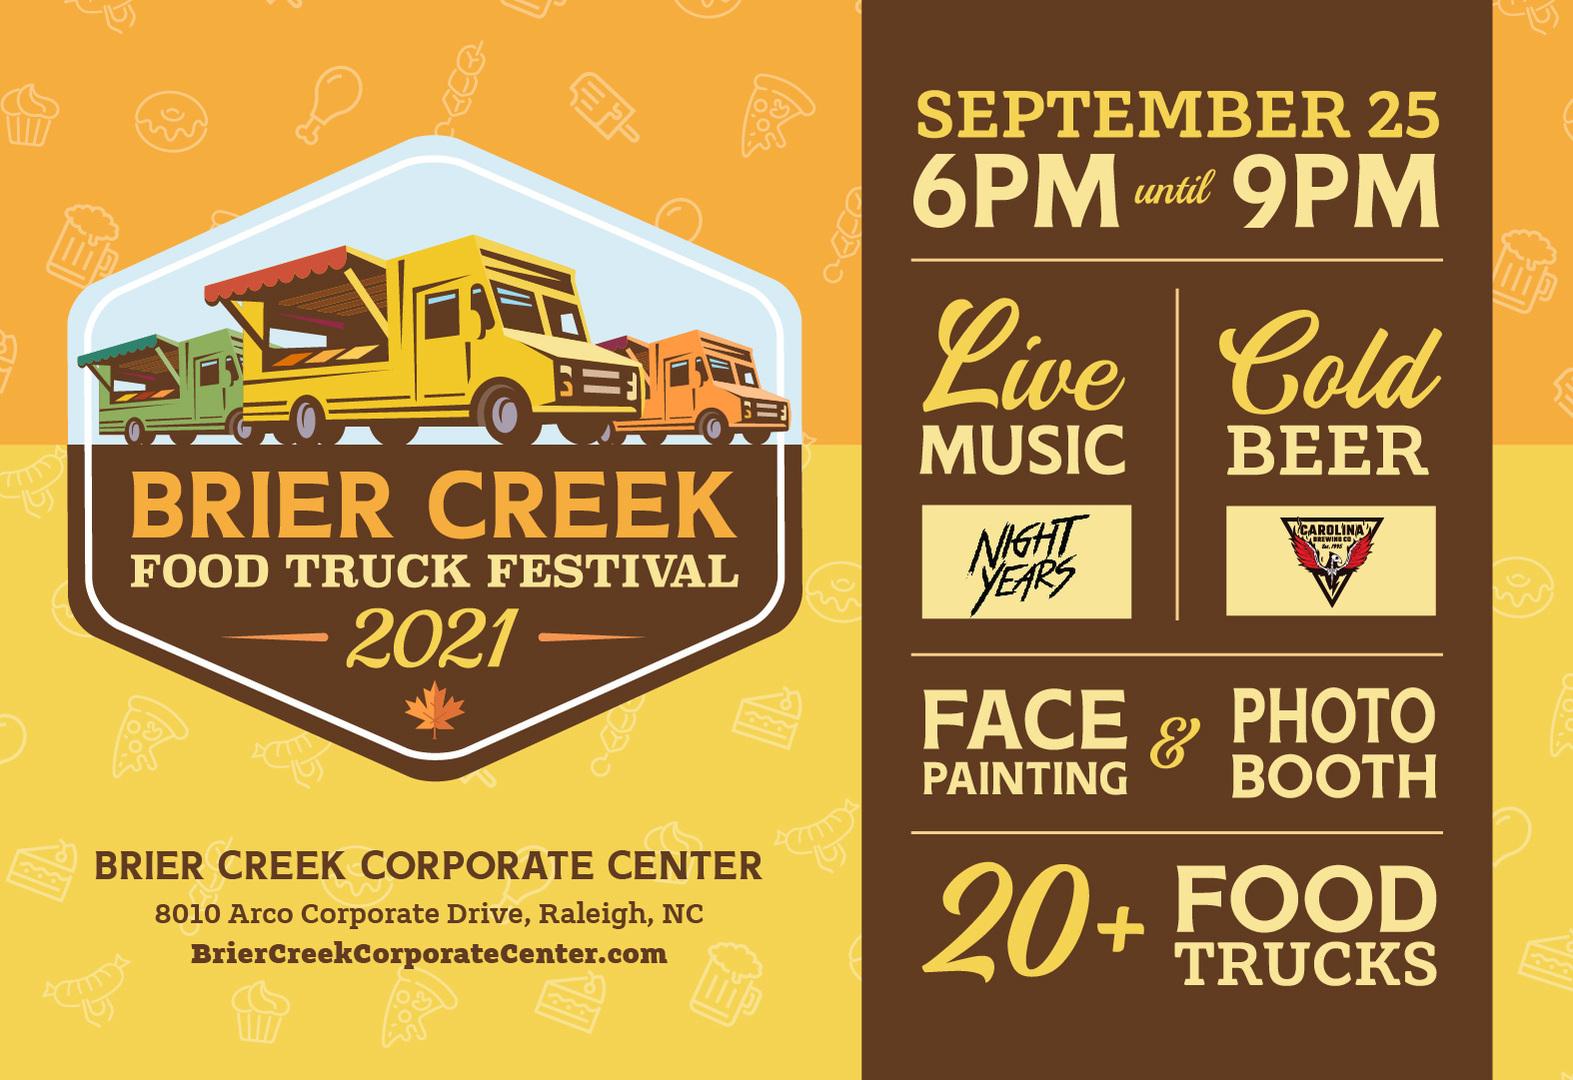 Brier Creek Food Truck Festival